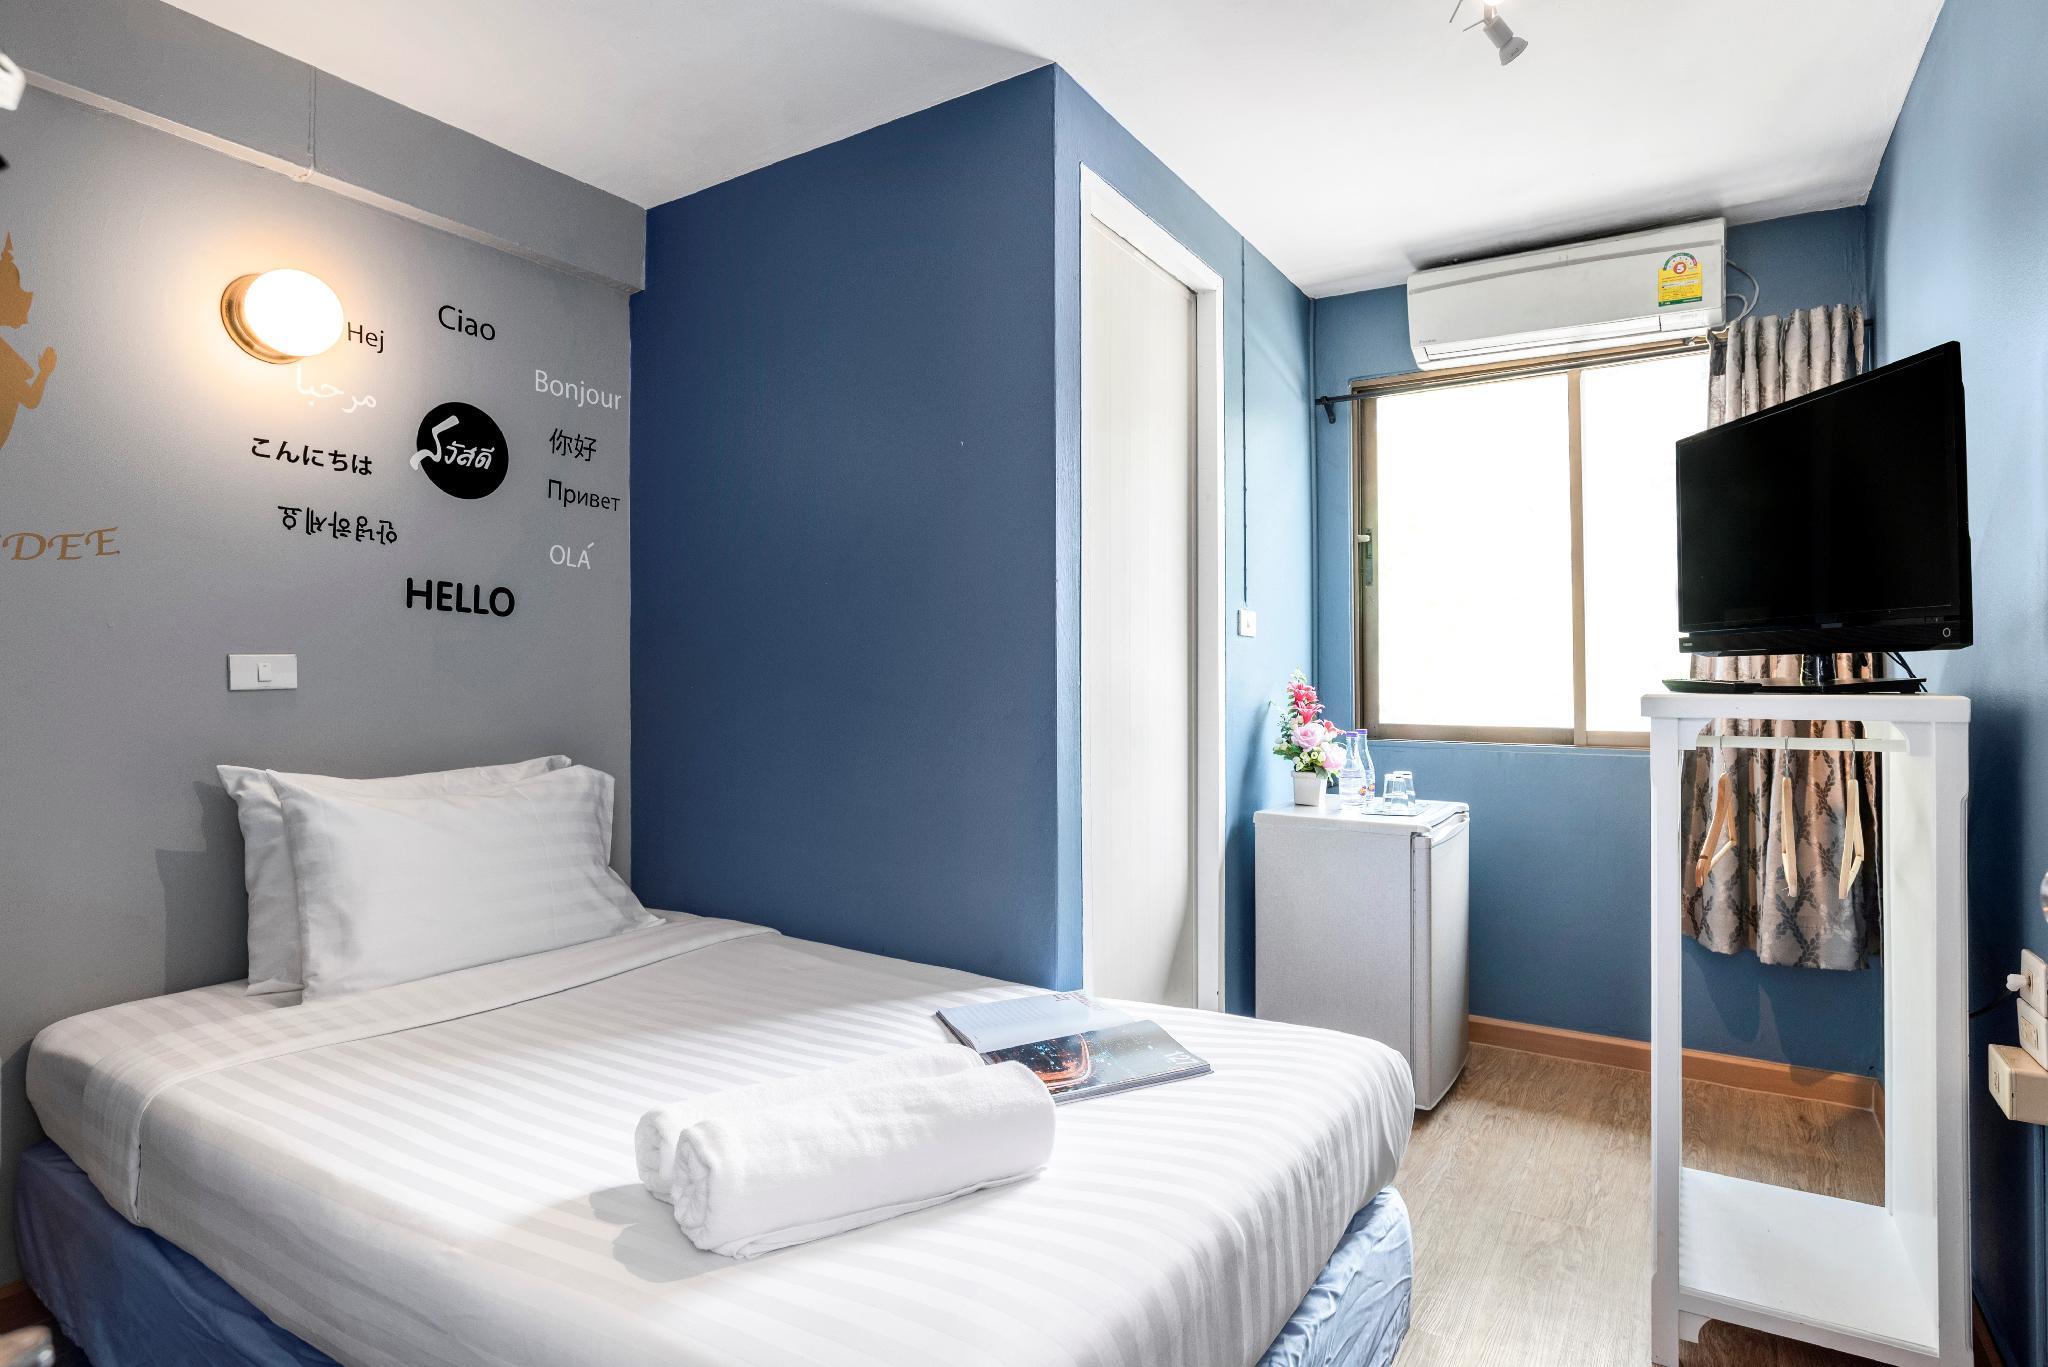 61376bac1b1f348ac2b69e0a06851fd9 - Hotel Budget di Kawasan Khao San Road Pilihan Backpacker